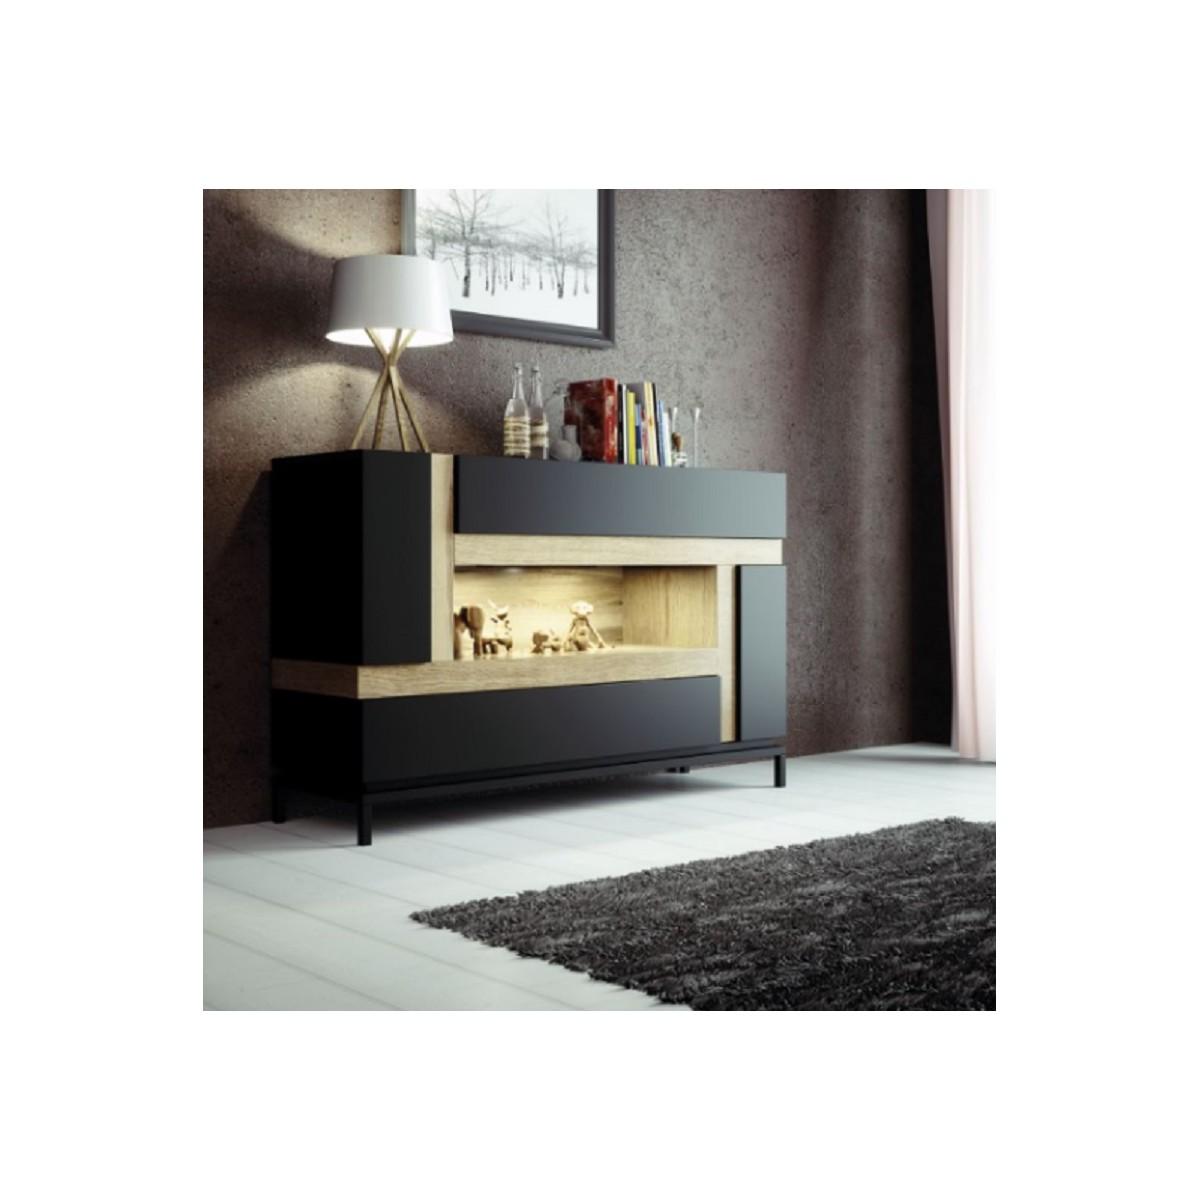 Muebles Hiloga Albacete ~ Obtenga ideas Diseño de muebles para su ...